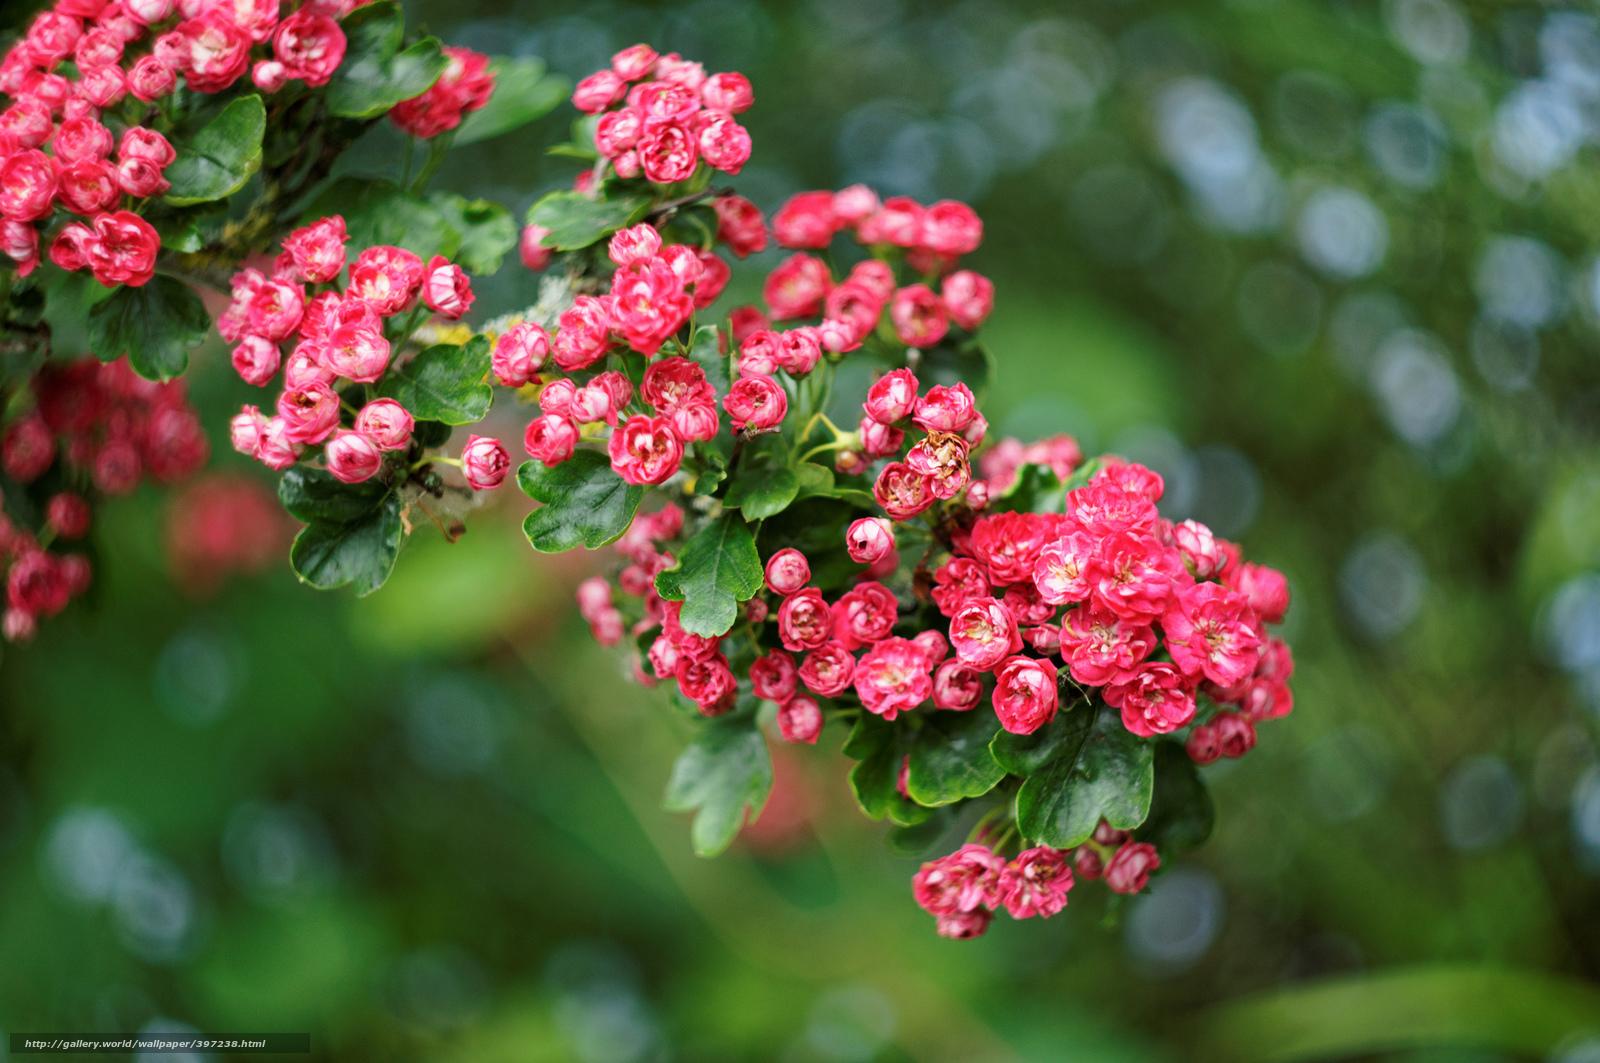 Briar rose plant